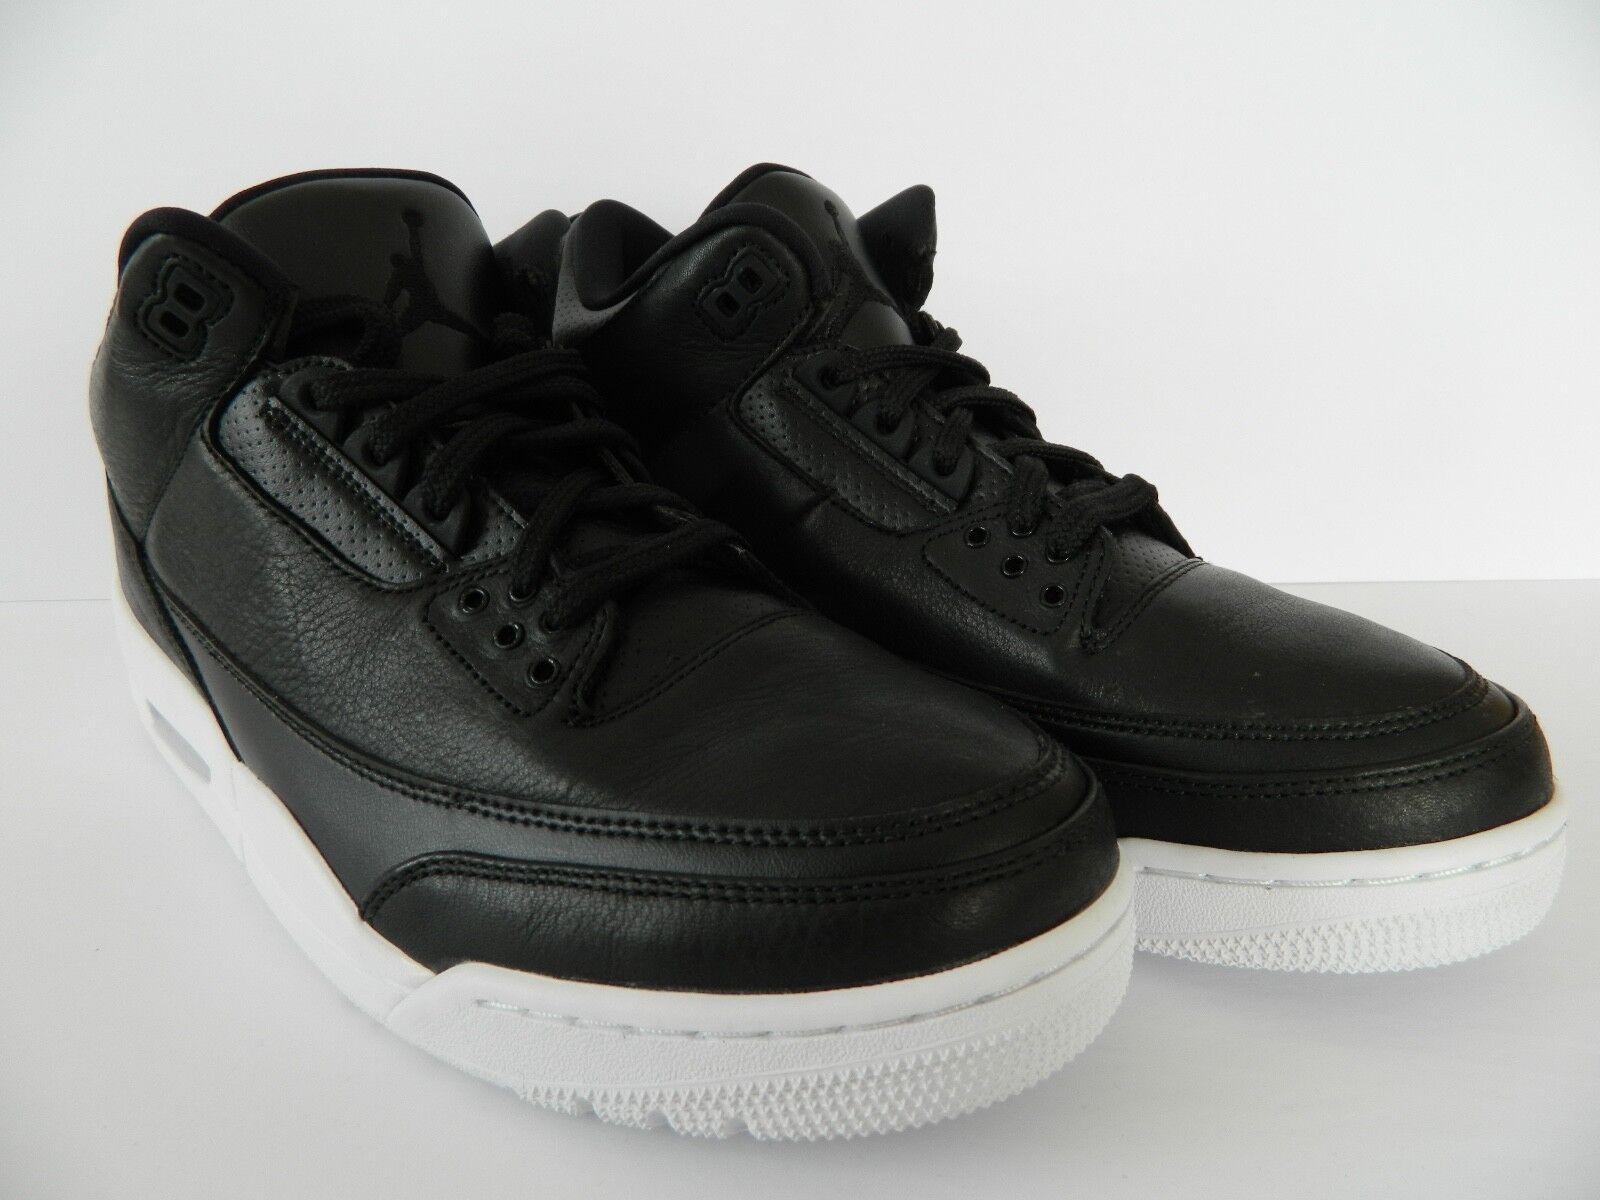 Nike Air Jordan 3 Retro ( Black/Black-White) ( 136064 020 ) NIB